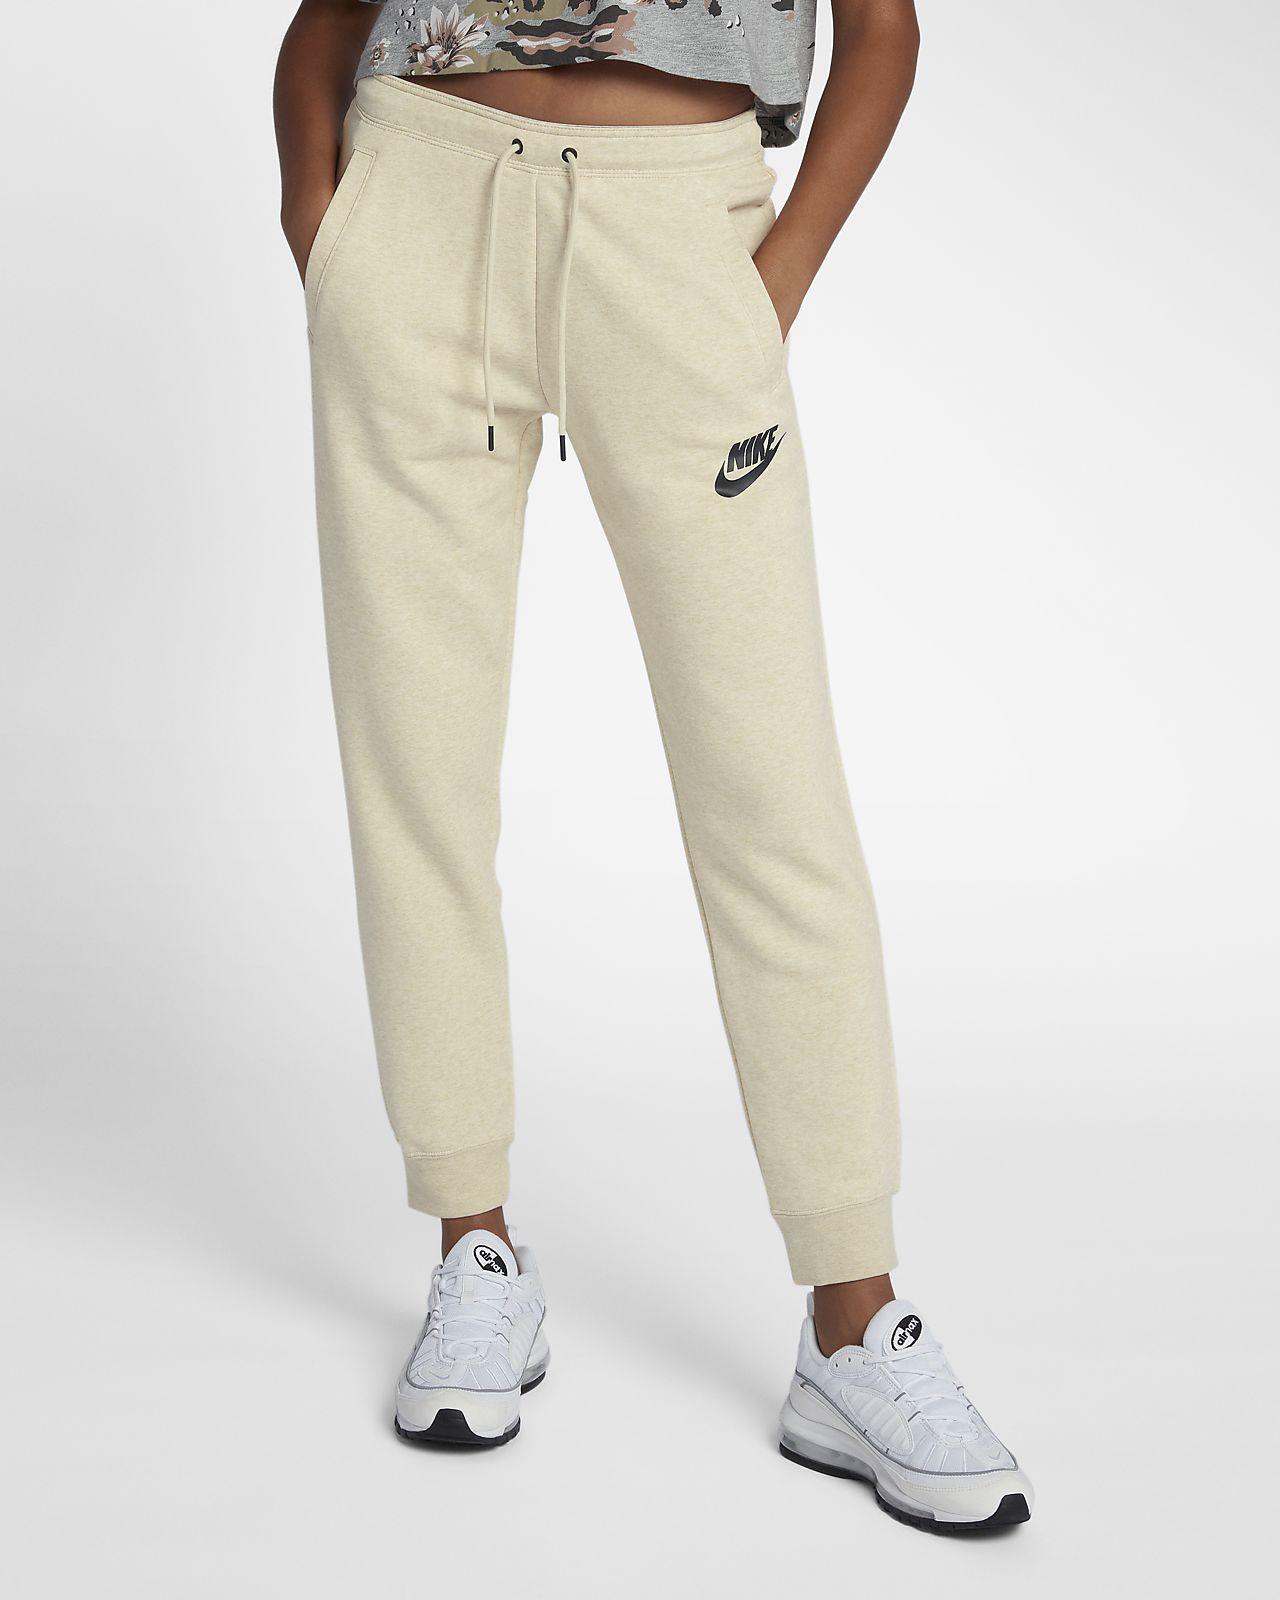 e9c208edf4 Pantalon Nike Sportswear Rally pour Femme. Nike.com CA